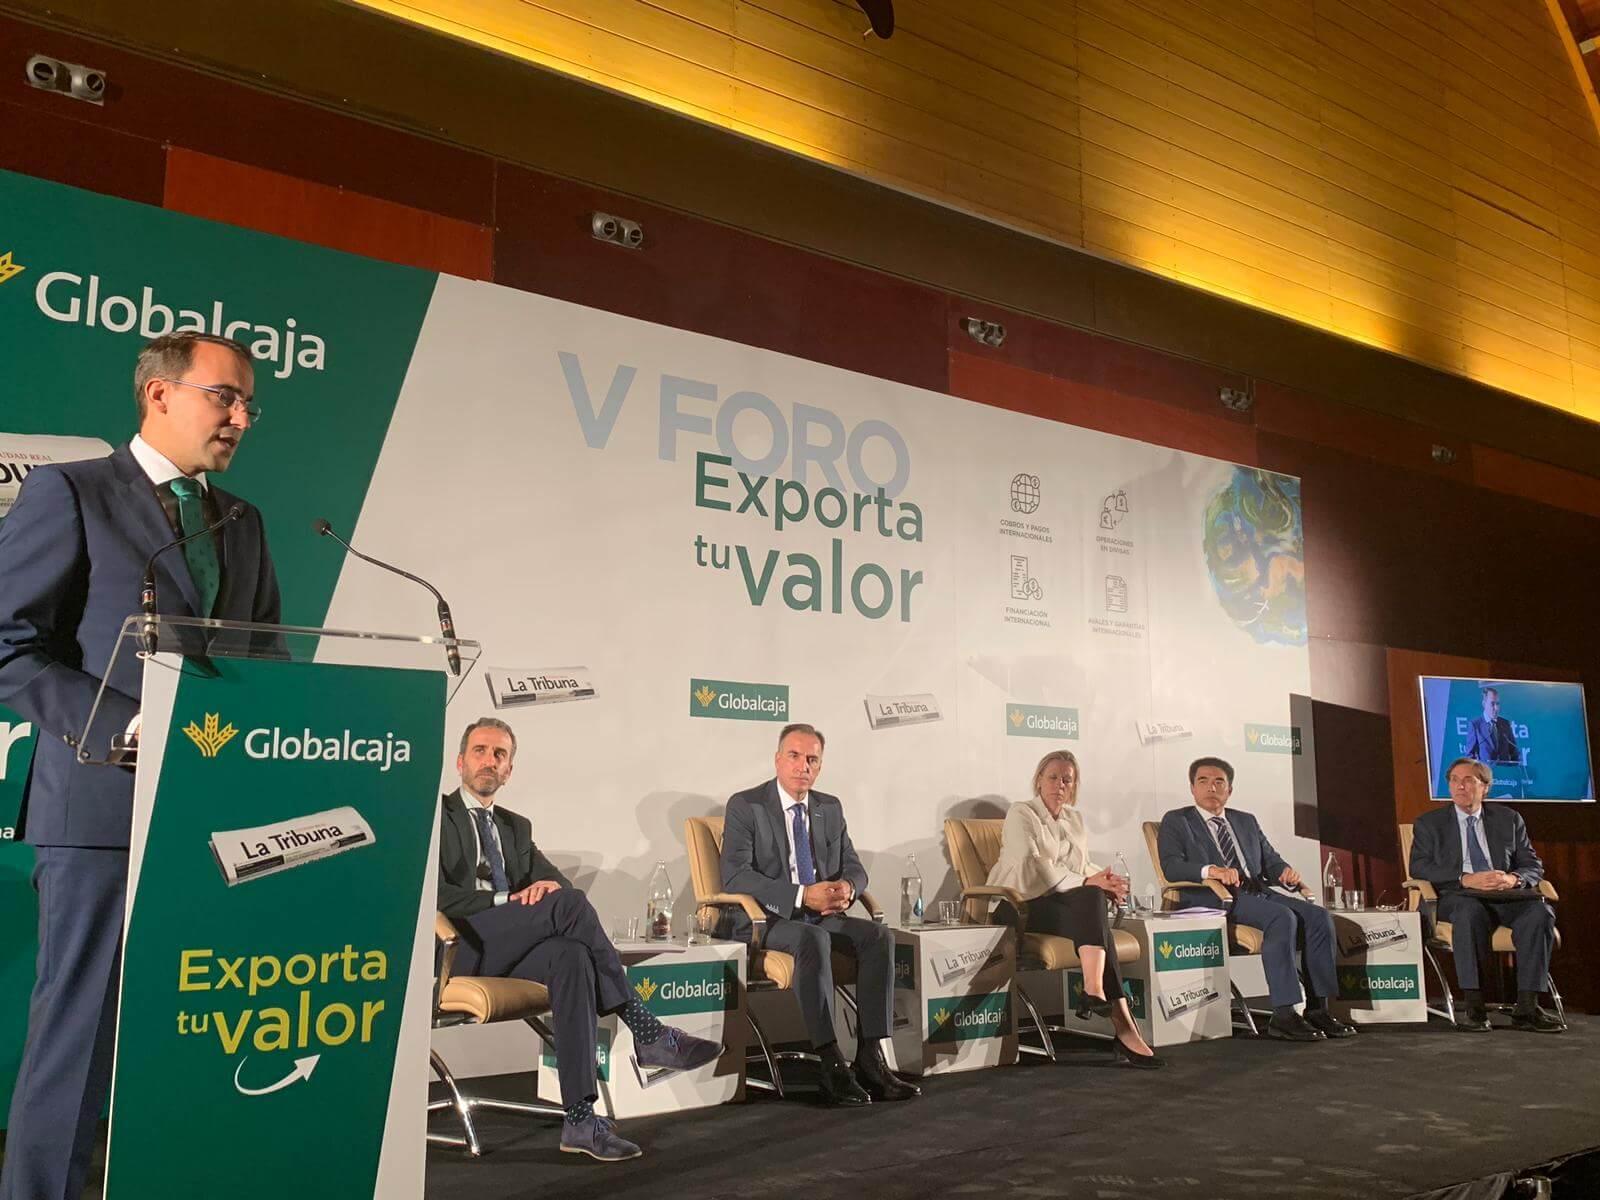 https://blog.globalcaja.es/wp-content/uploads/2019/10/V-Foro-exporta-tu-valor-Globalcaja.jpg